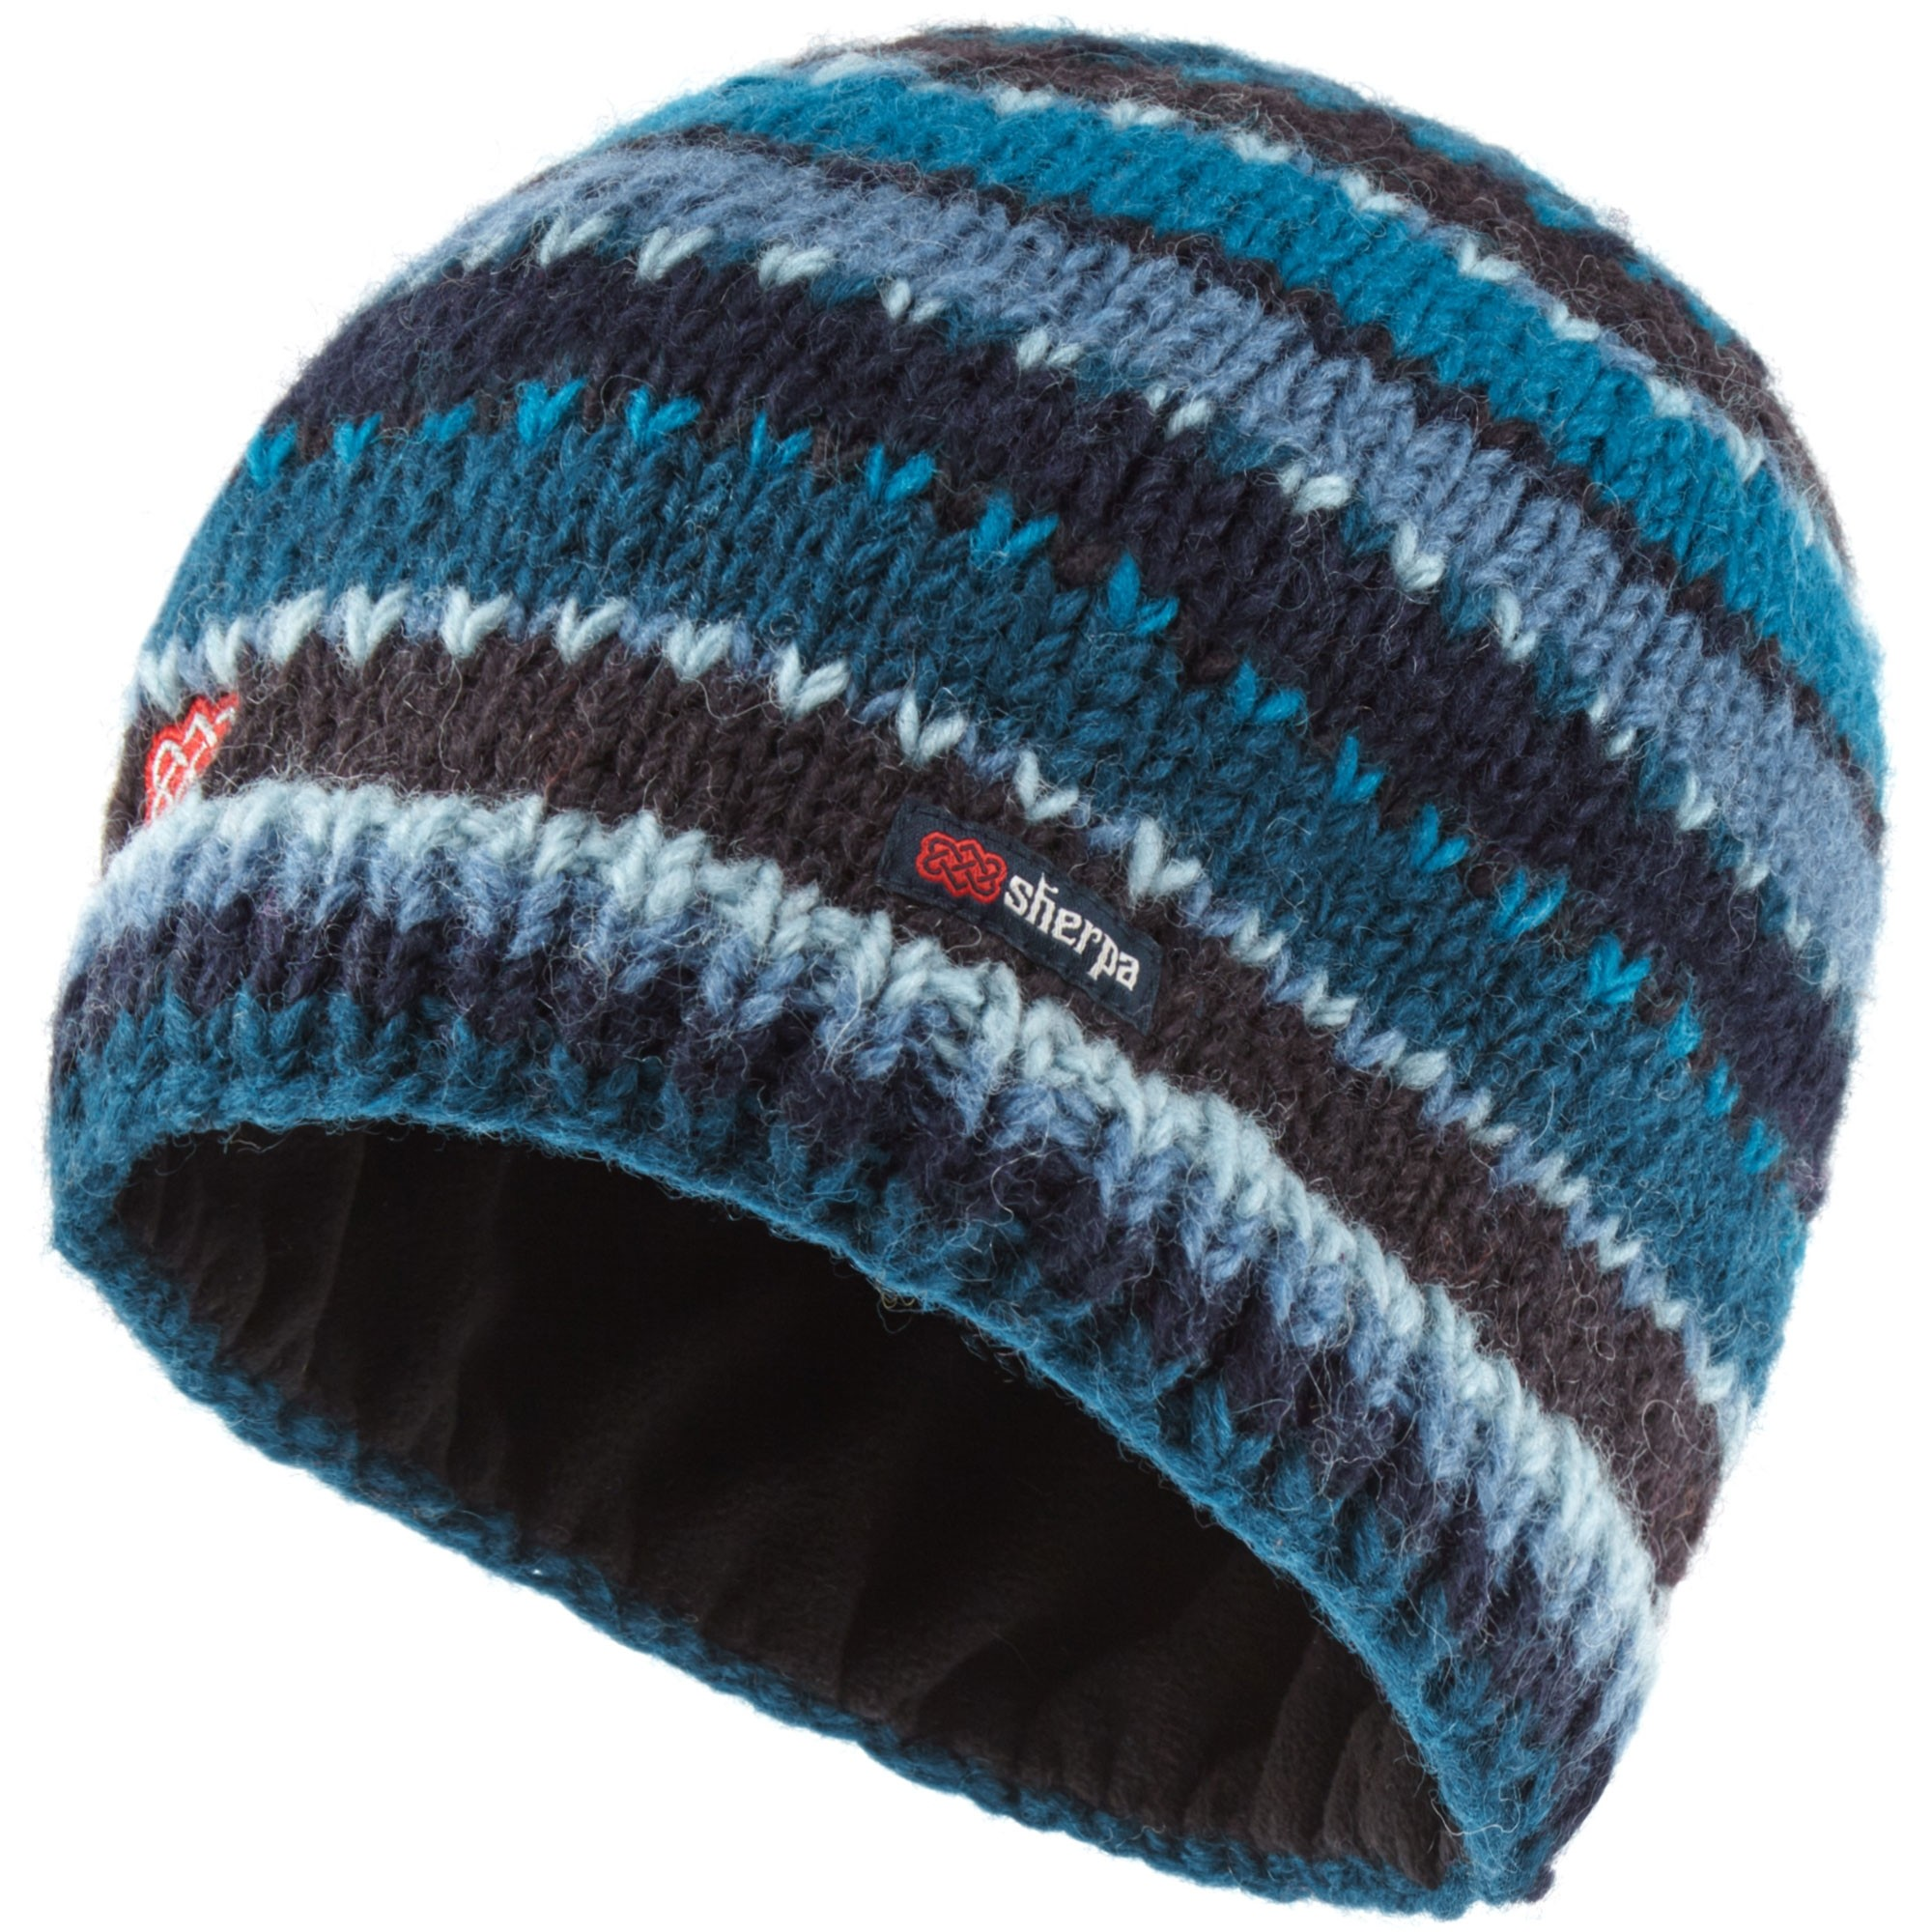 Sherpa Khunga Hat - Rathee